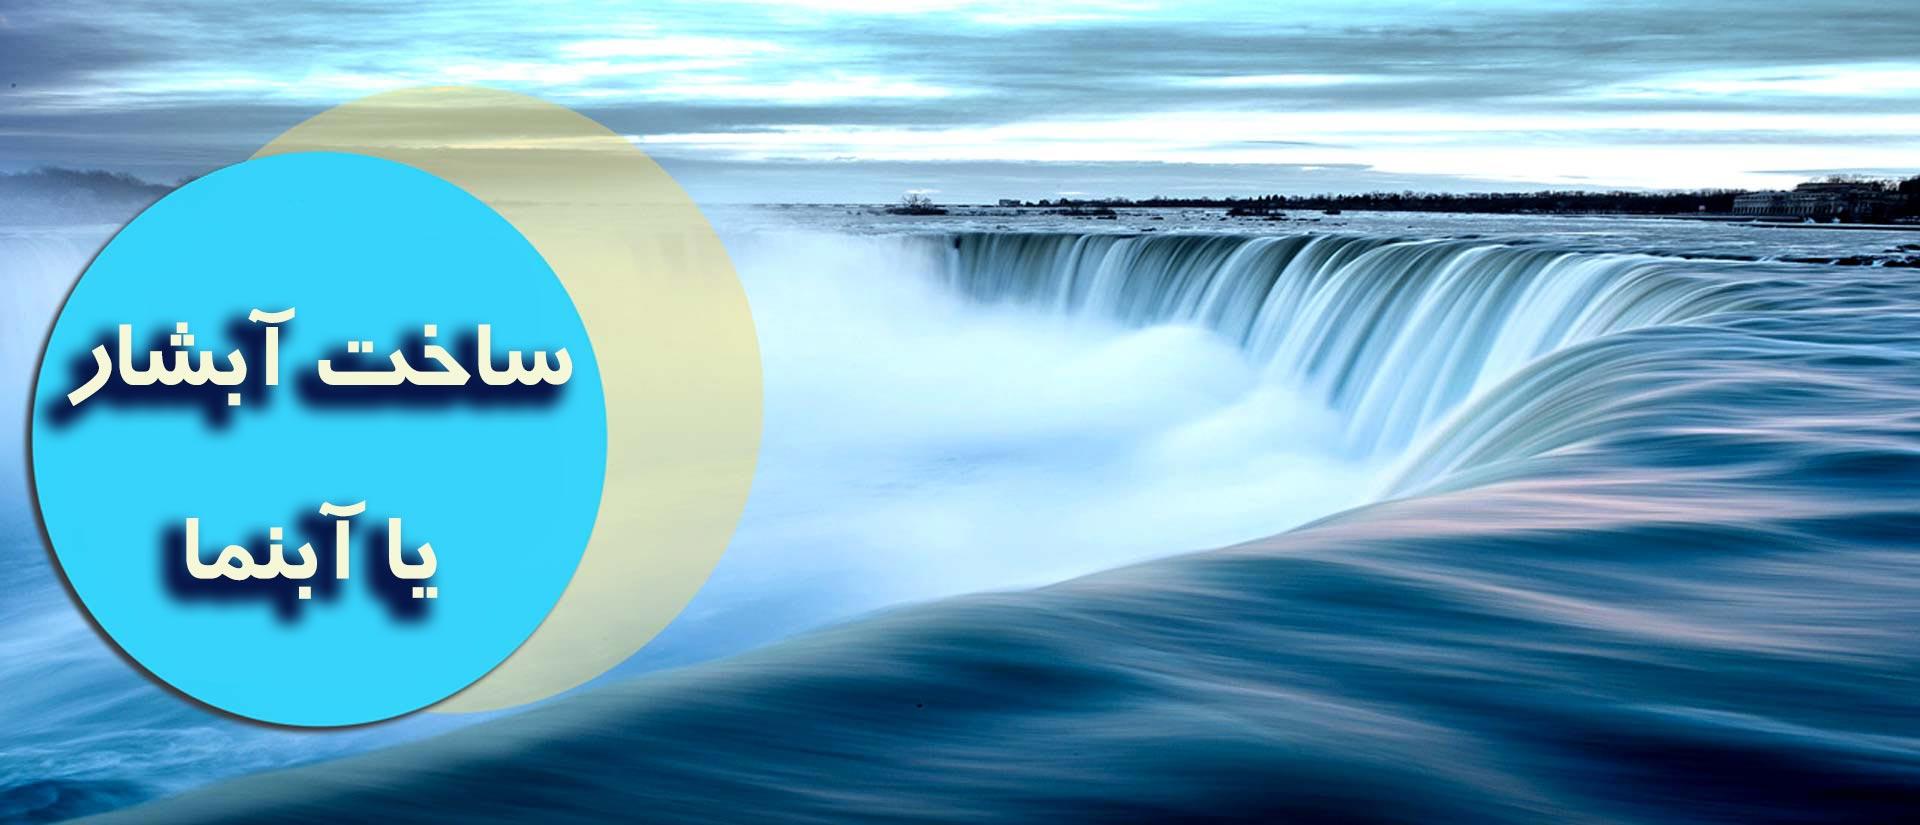 abshar 1sarbarg 1 1 - ساخت آبشار تزیینی ، آبنمای تزیینی